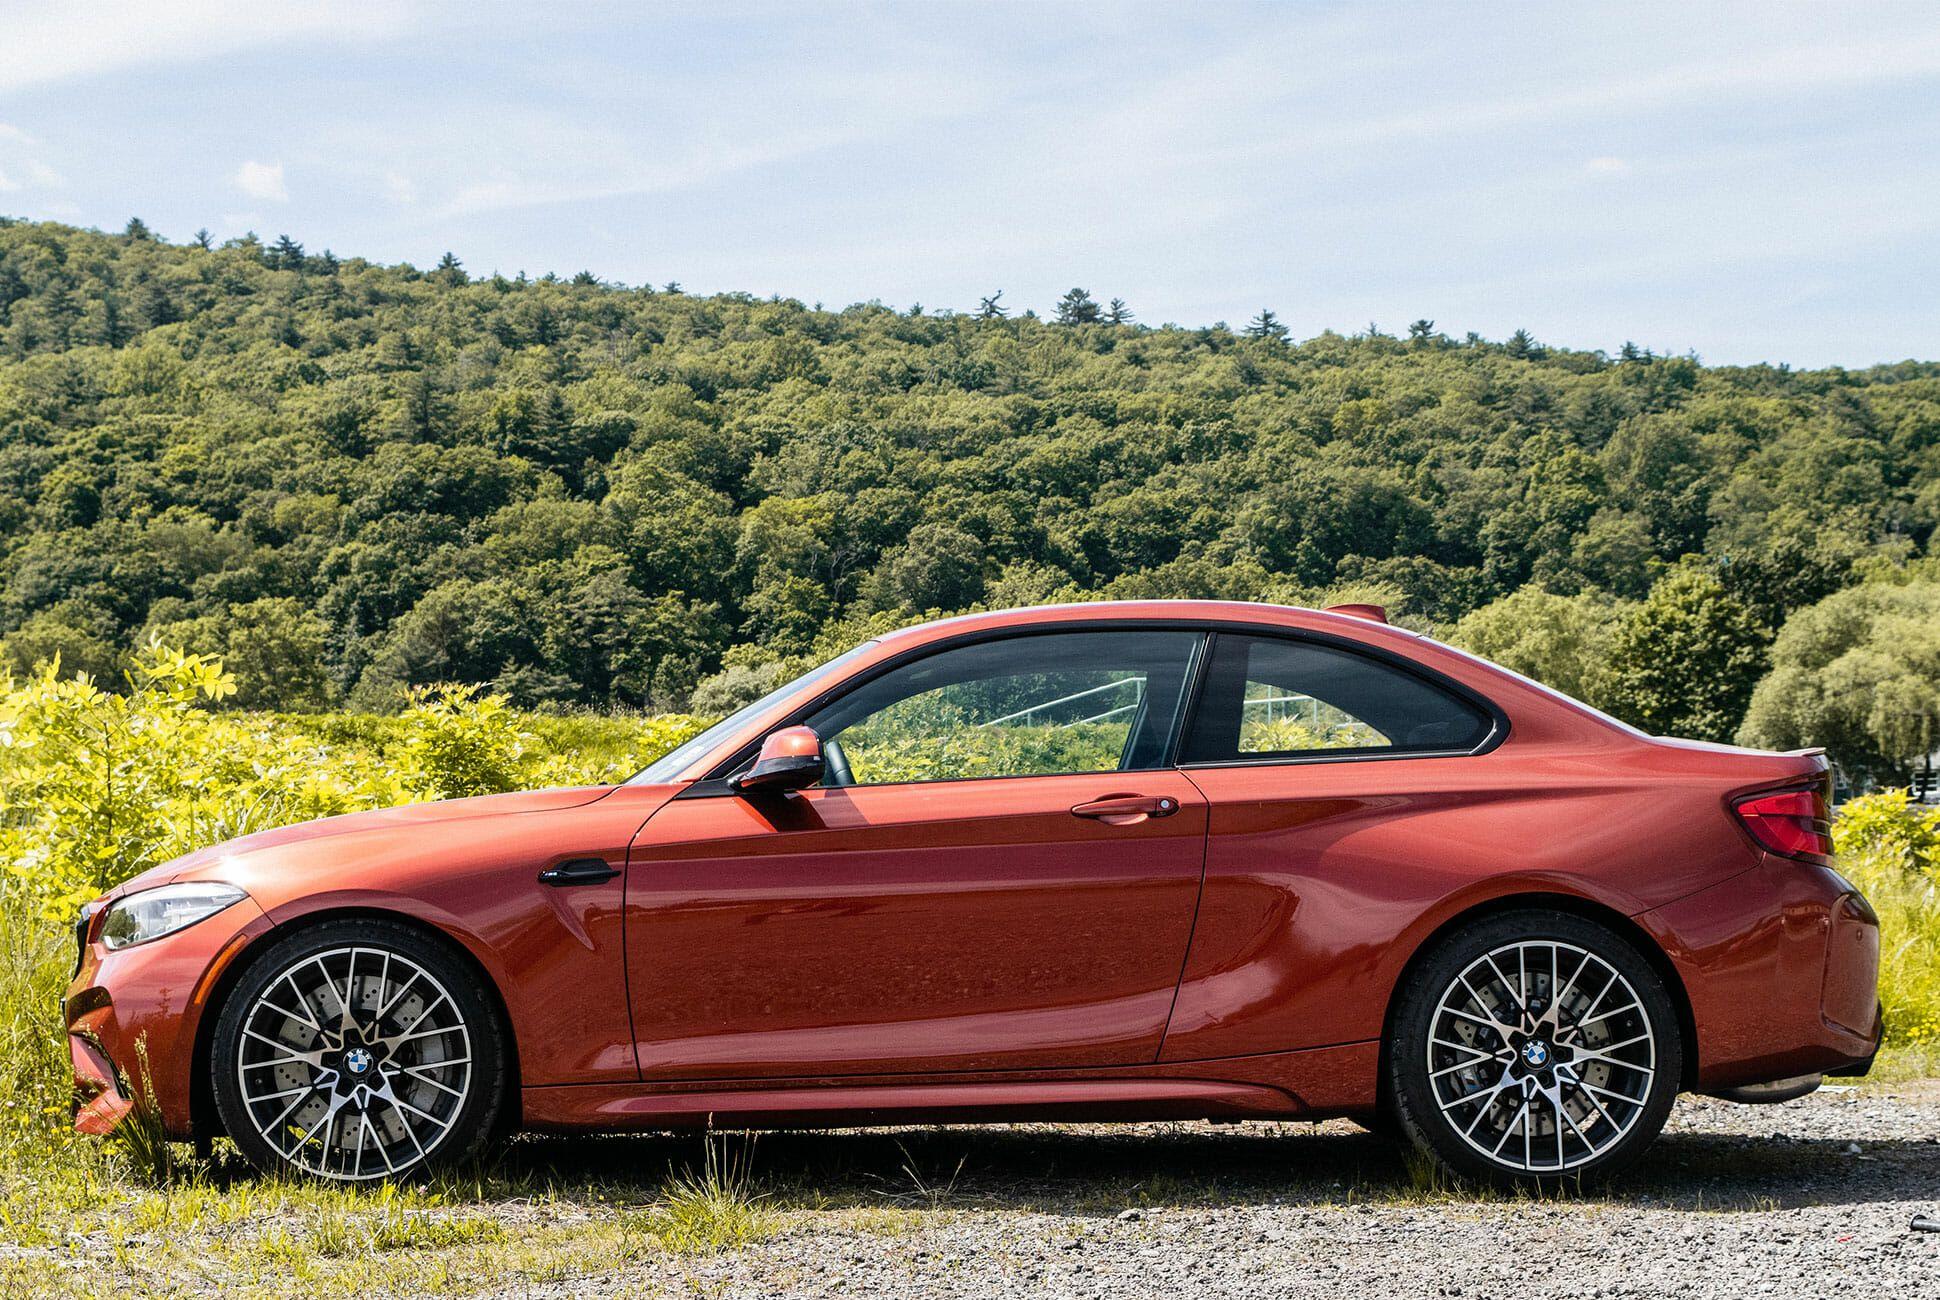 BMW-M2-Review-gear-patrol-slide-3-2